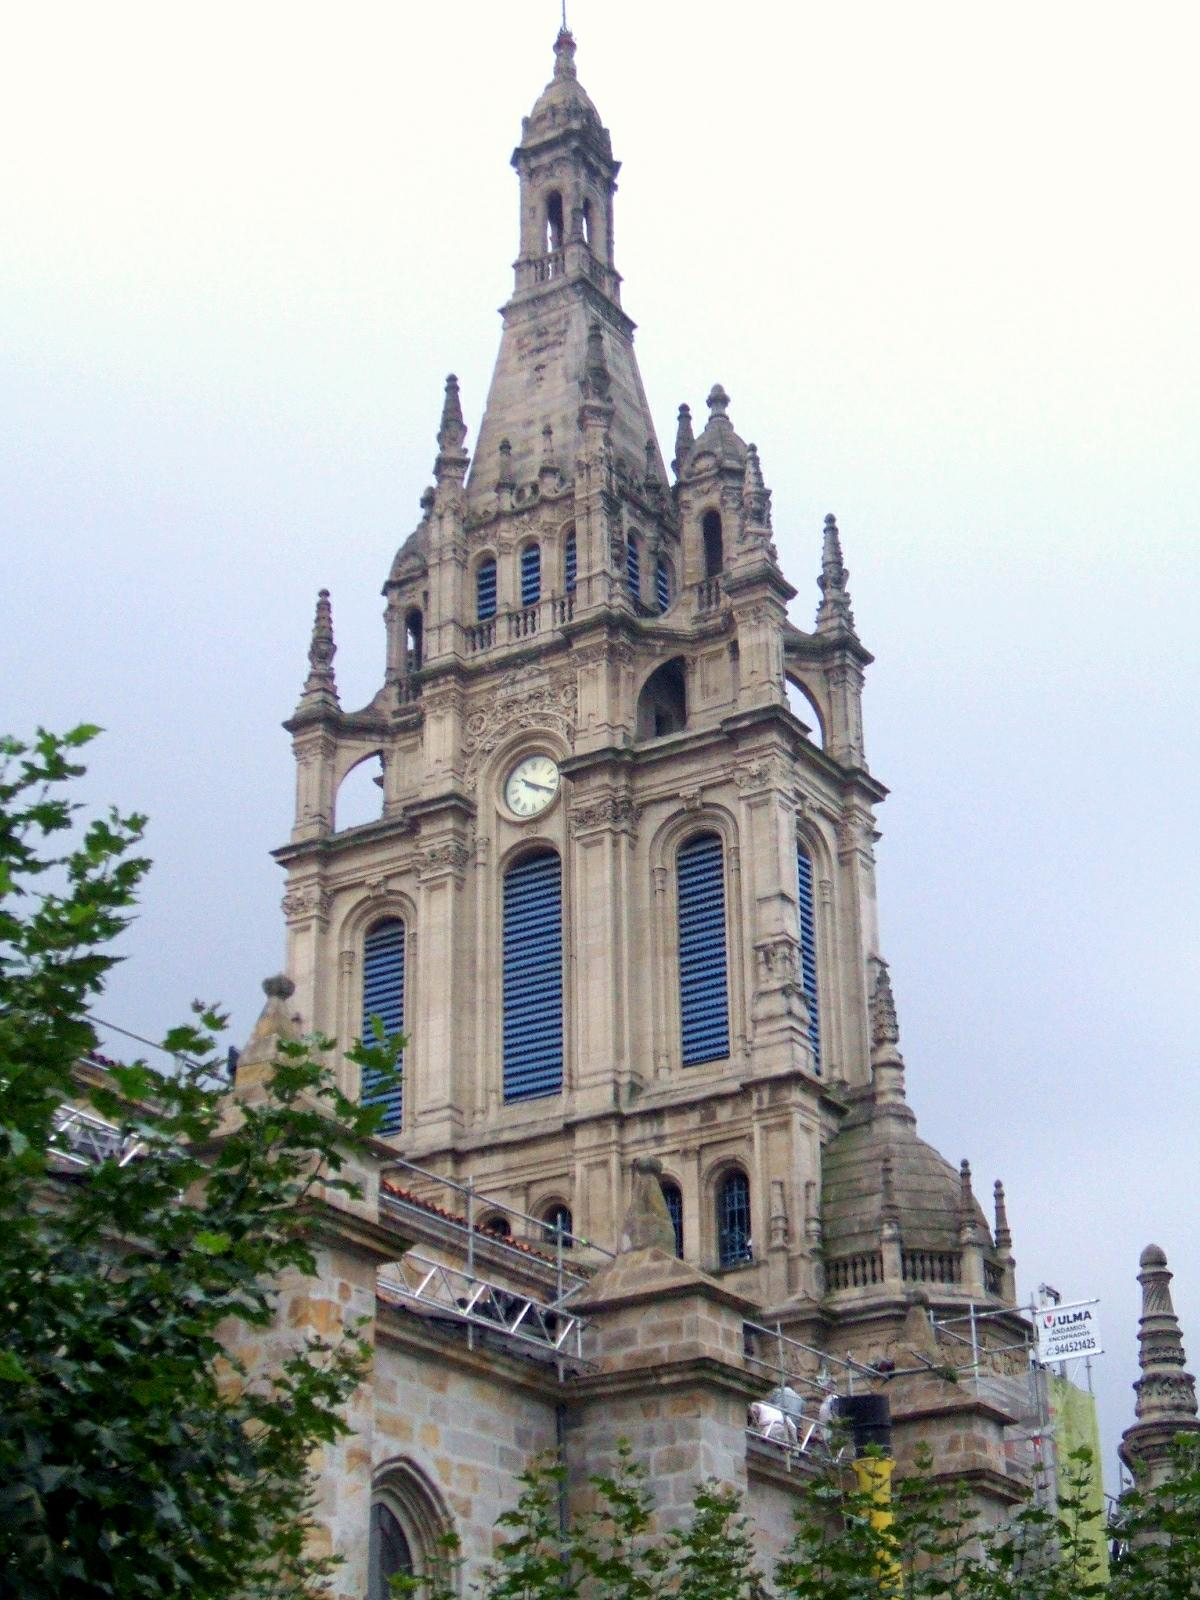 File:Bilbao - Basilica de Begoña 12.JPG - Wikimedia Commons